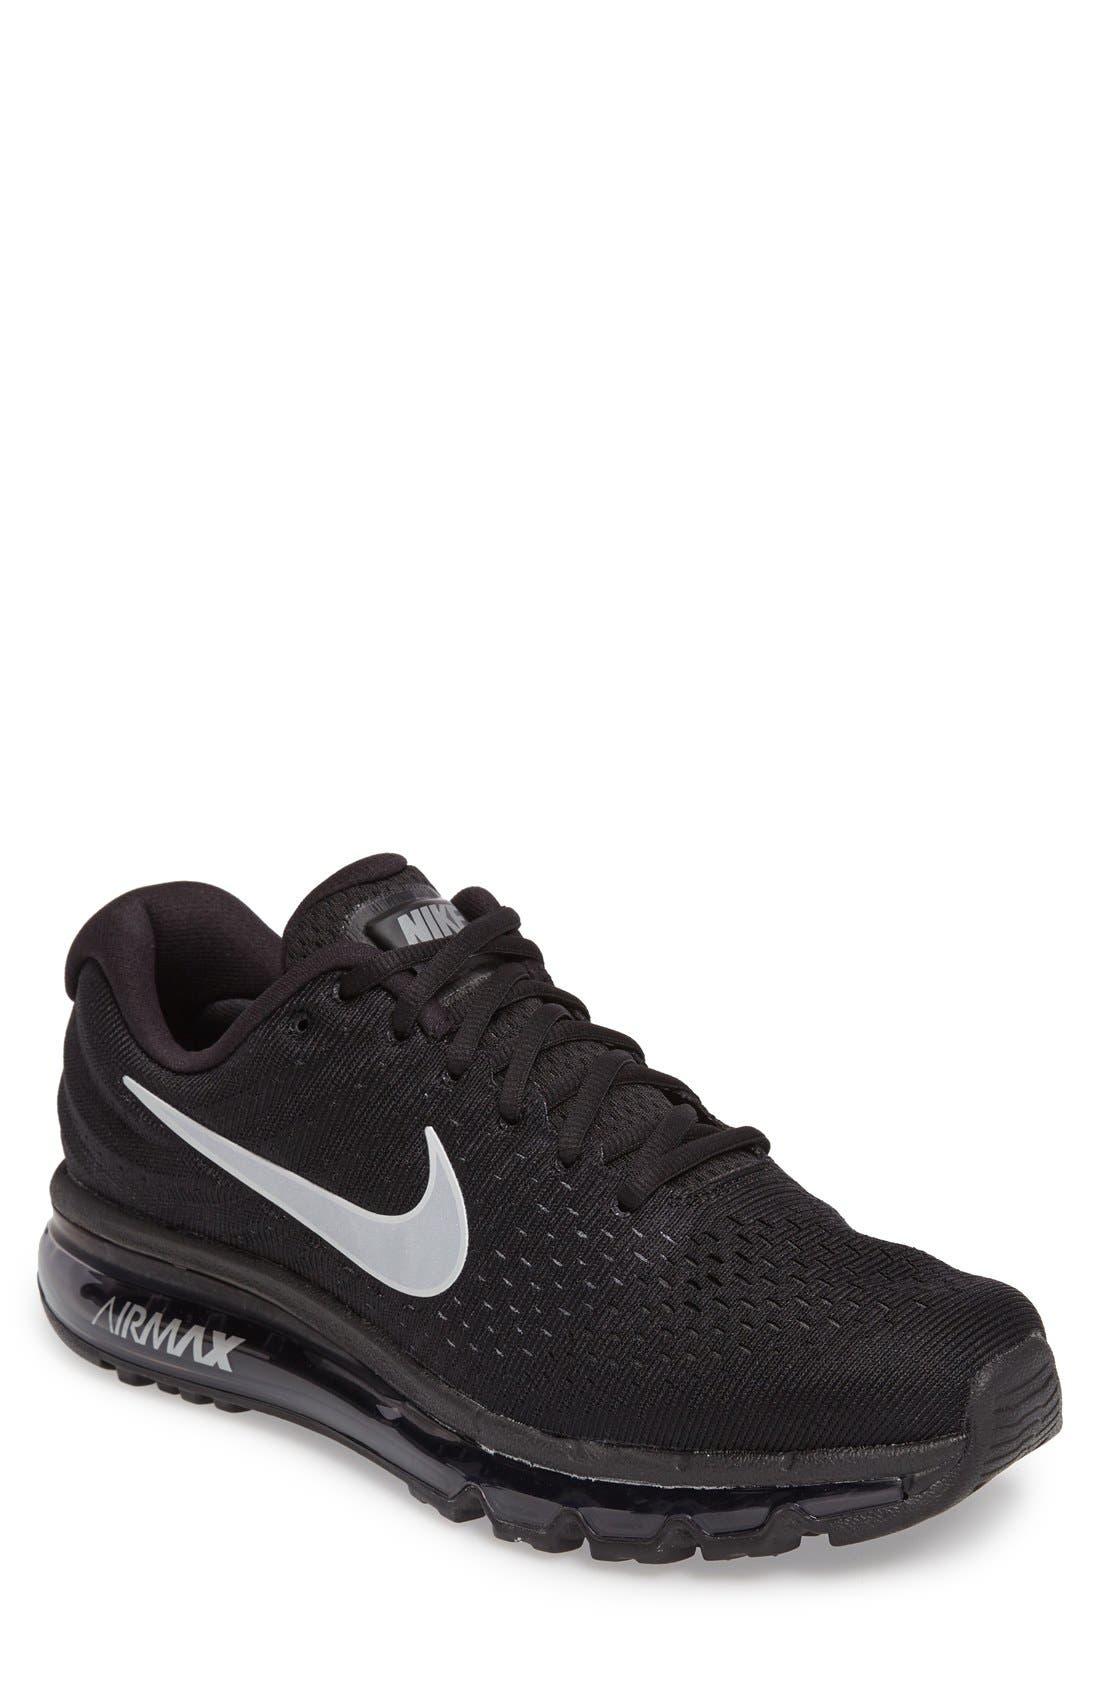 Main Image - Nike Air Max 2017 Running Shoe (Men)